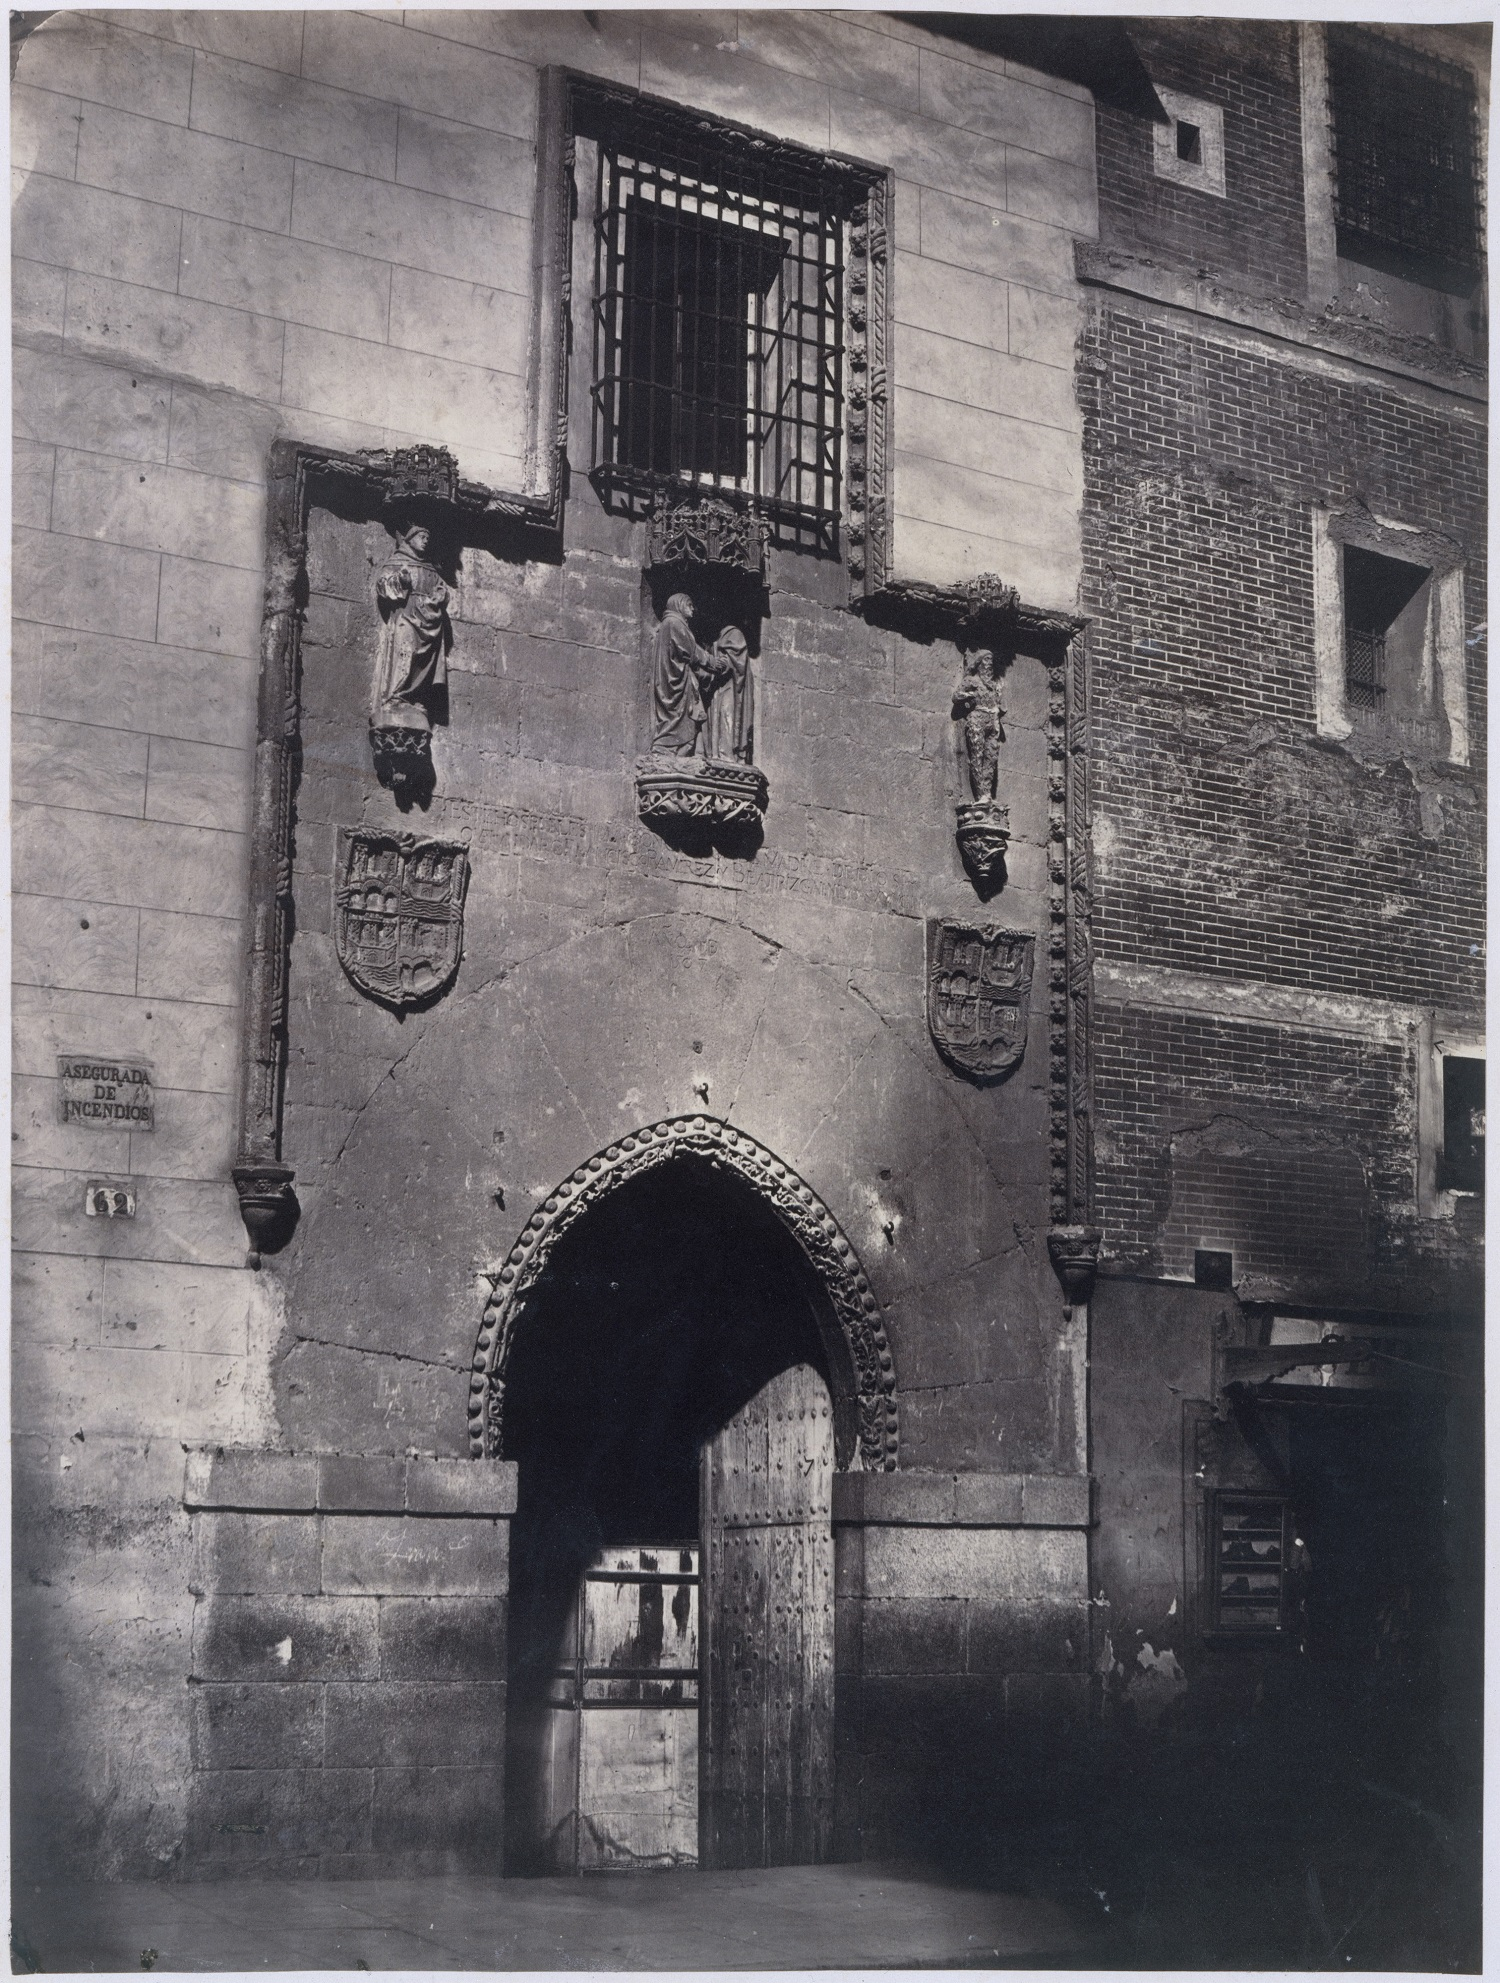 Fachada del hospital fotografiada por Charles Clifford a mediados del siglo xix